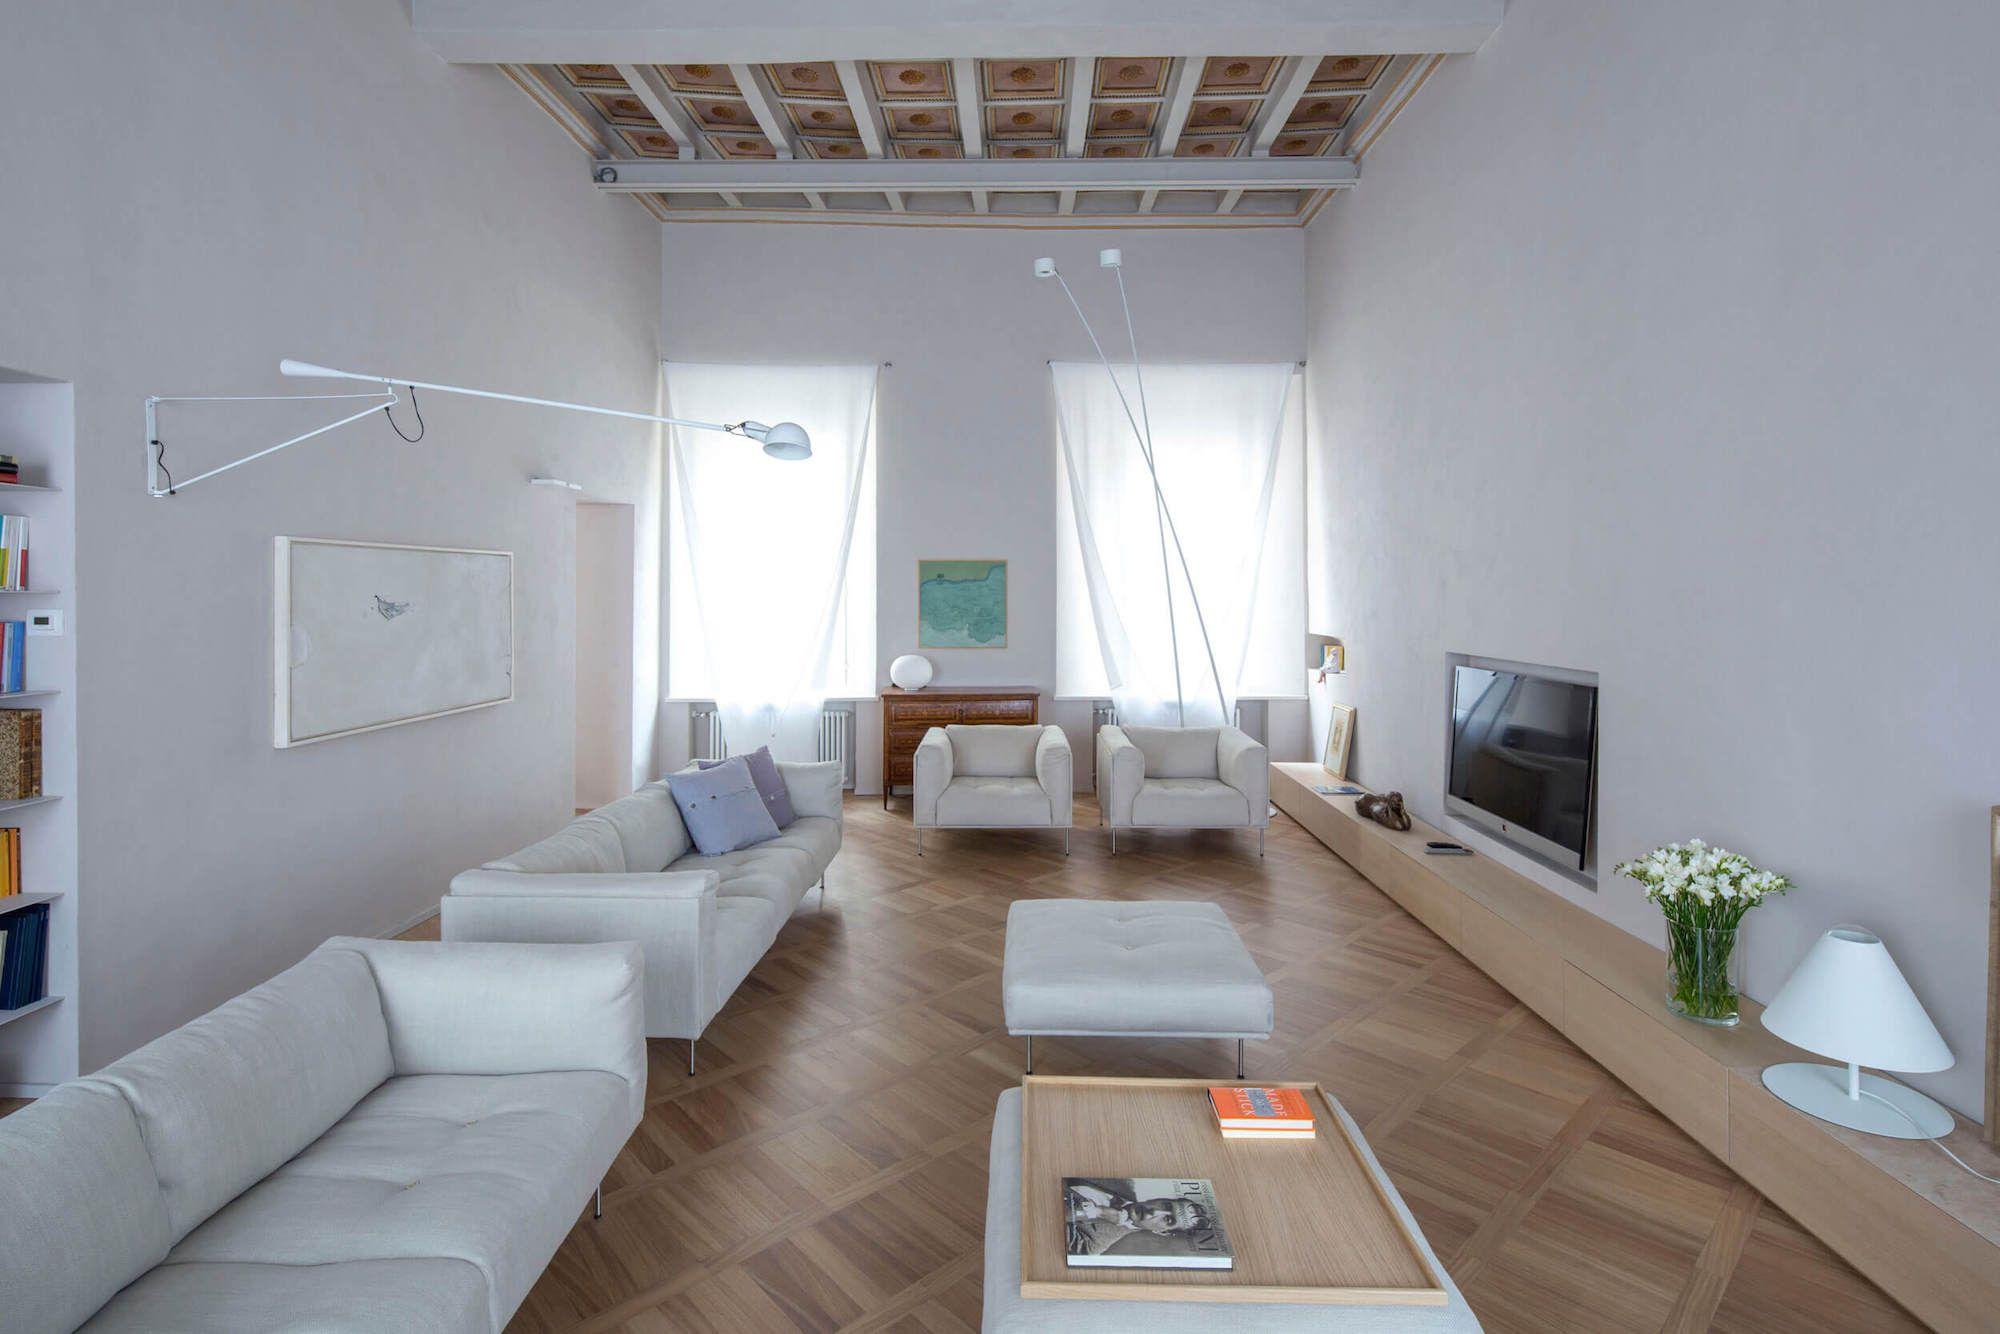 apartment-piacenza-studio-blesi-subitoni-01